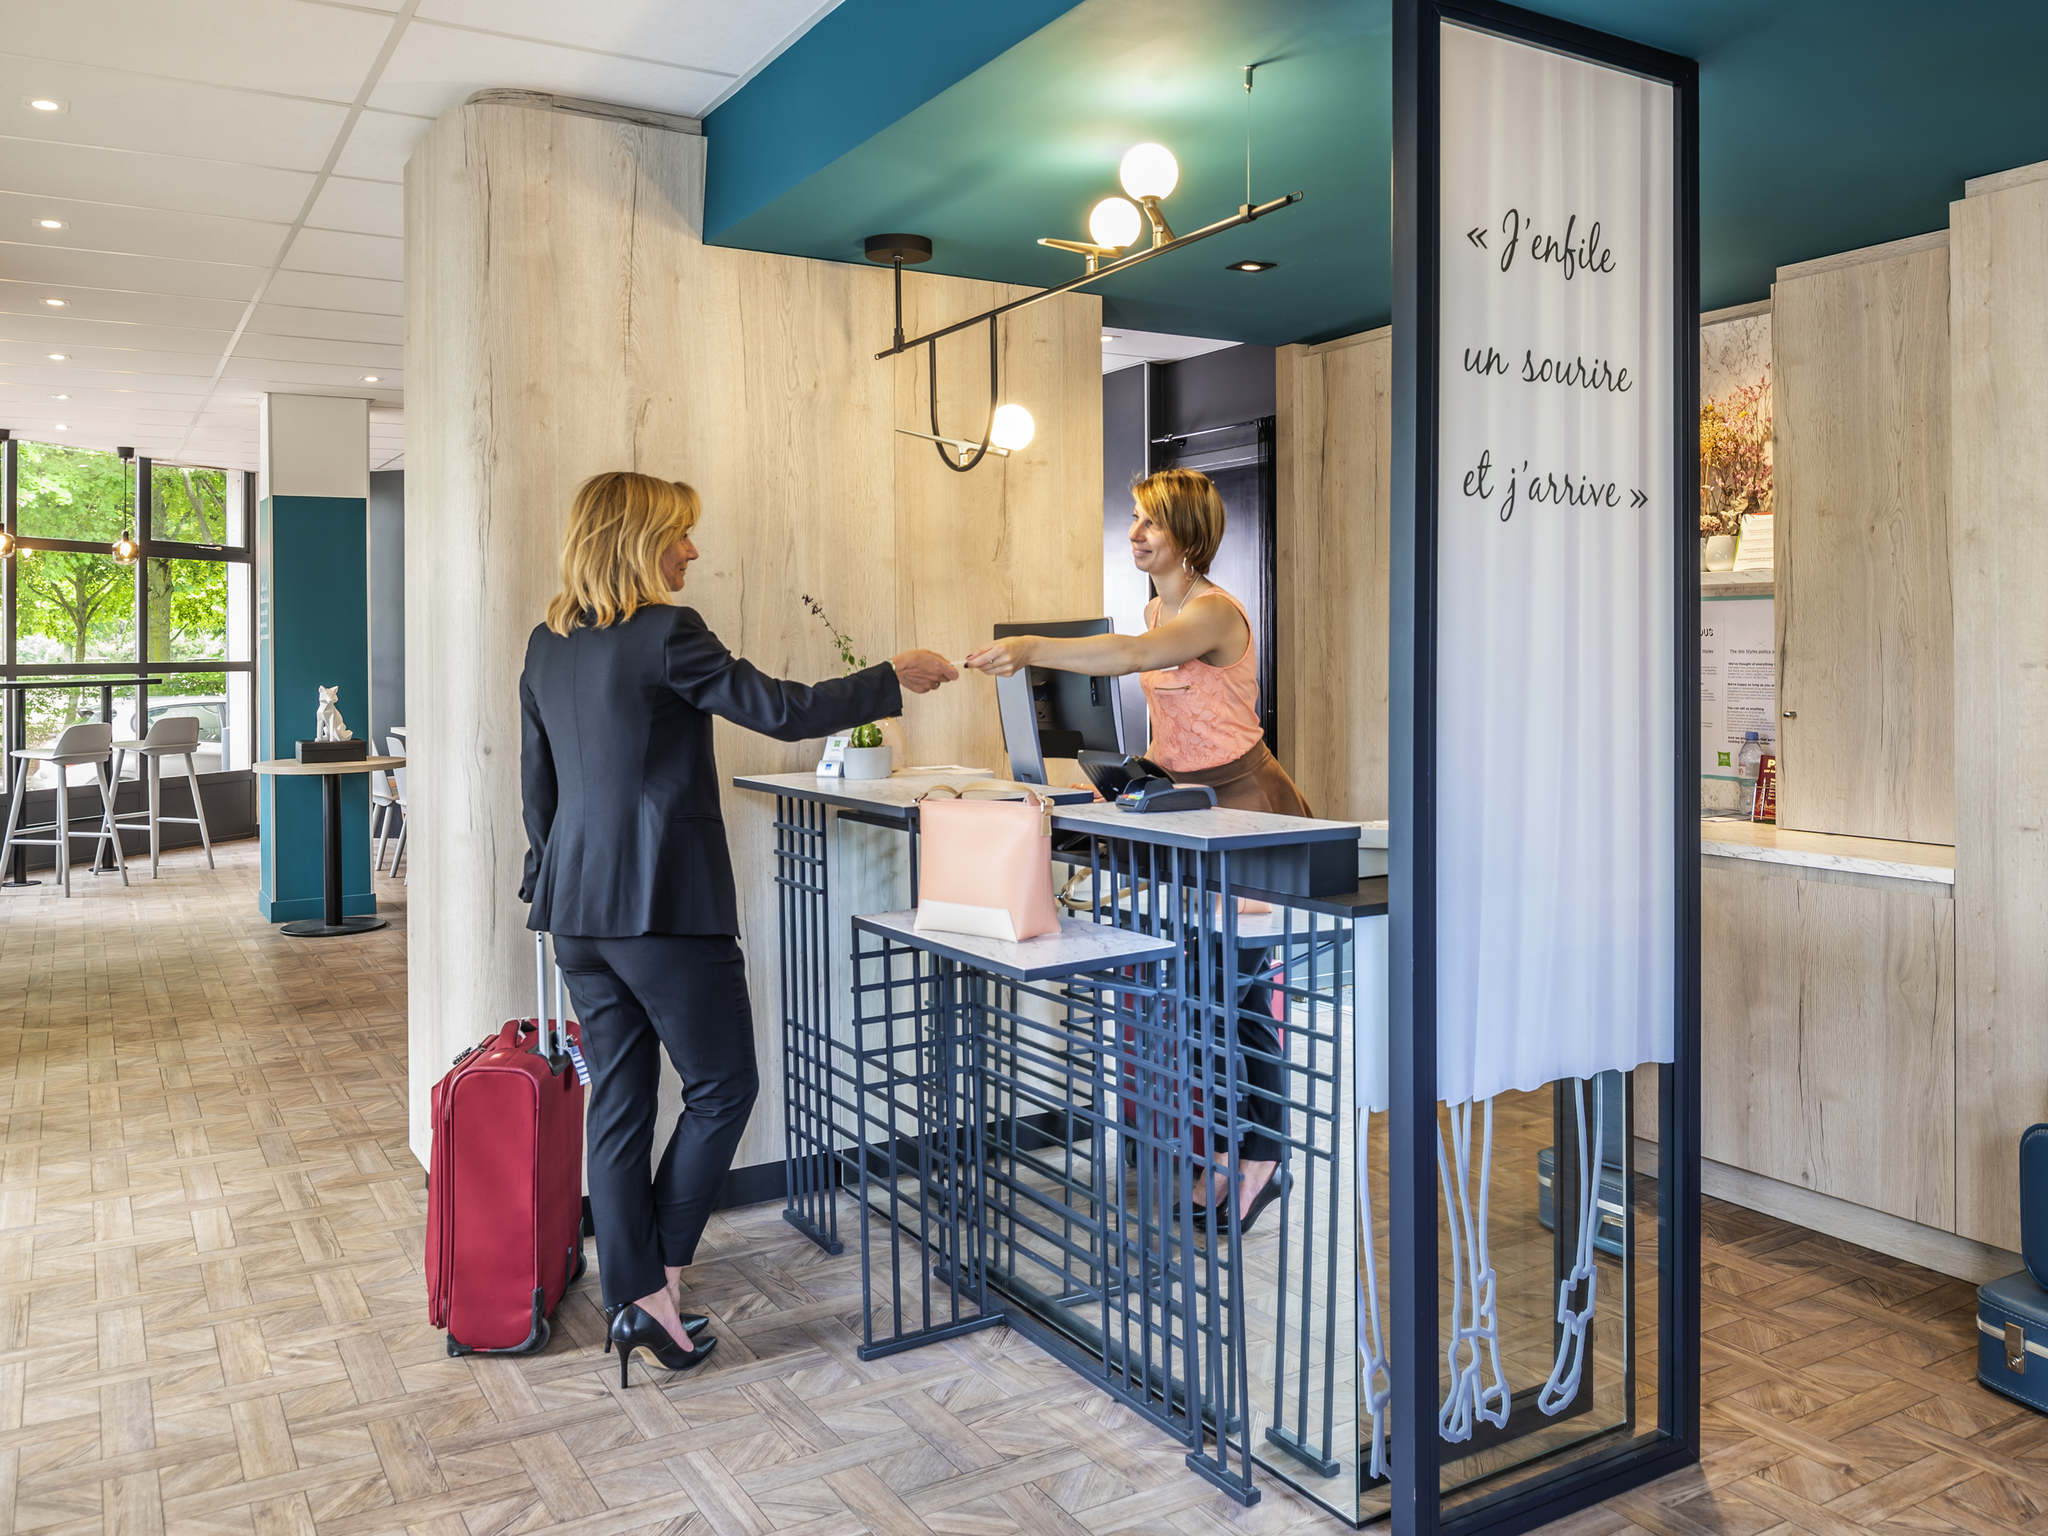 Otel – ibis Styles Sceaux Paris Sud (Opening June 2018)